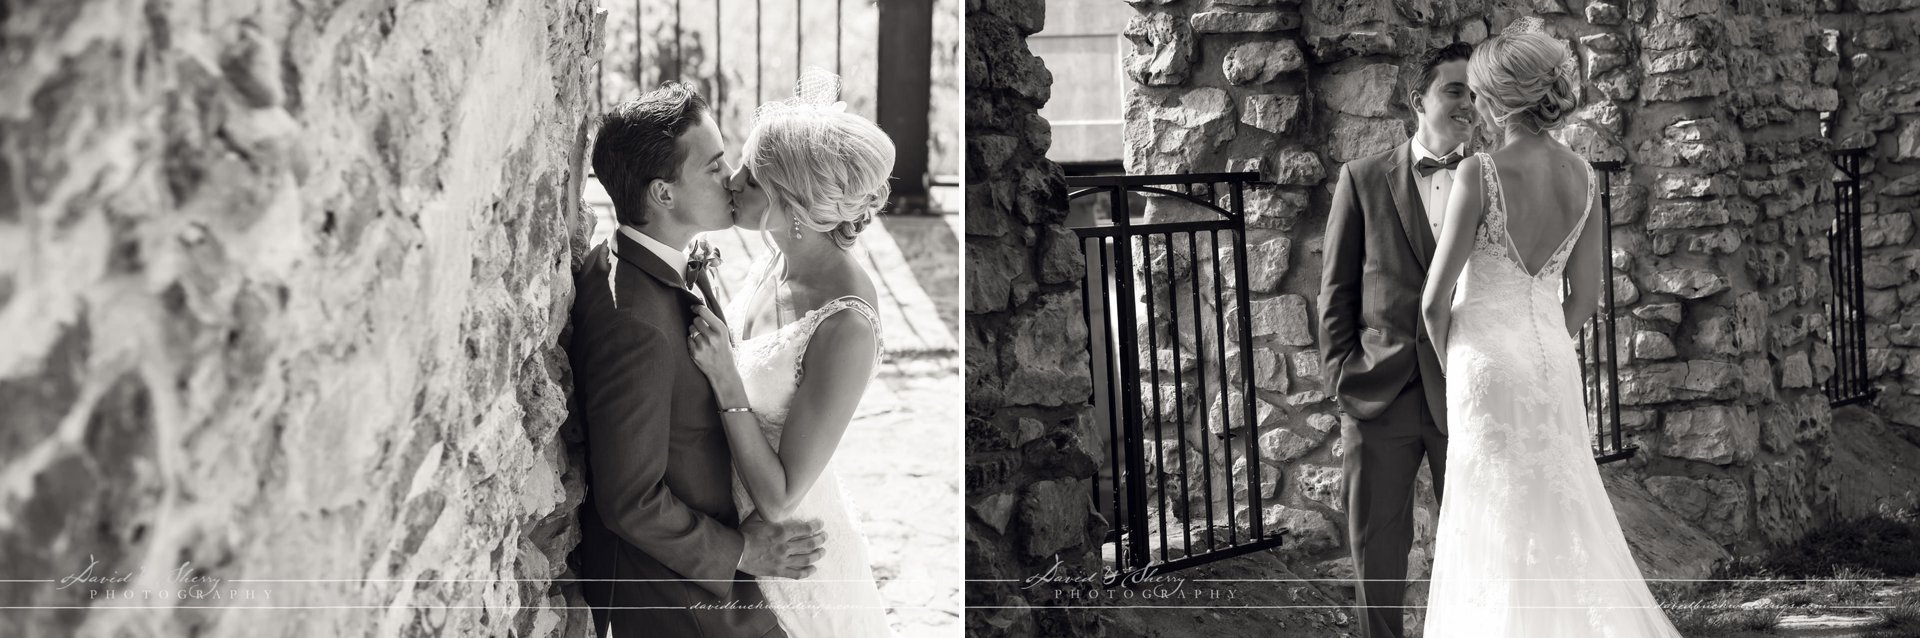 cambridge-mill-wedding-david-sherry-photography-20